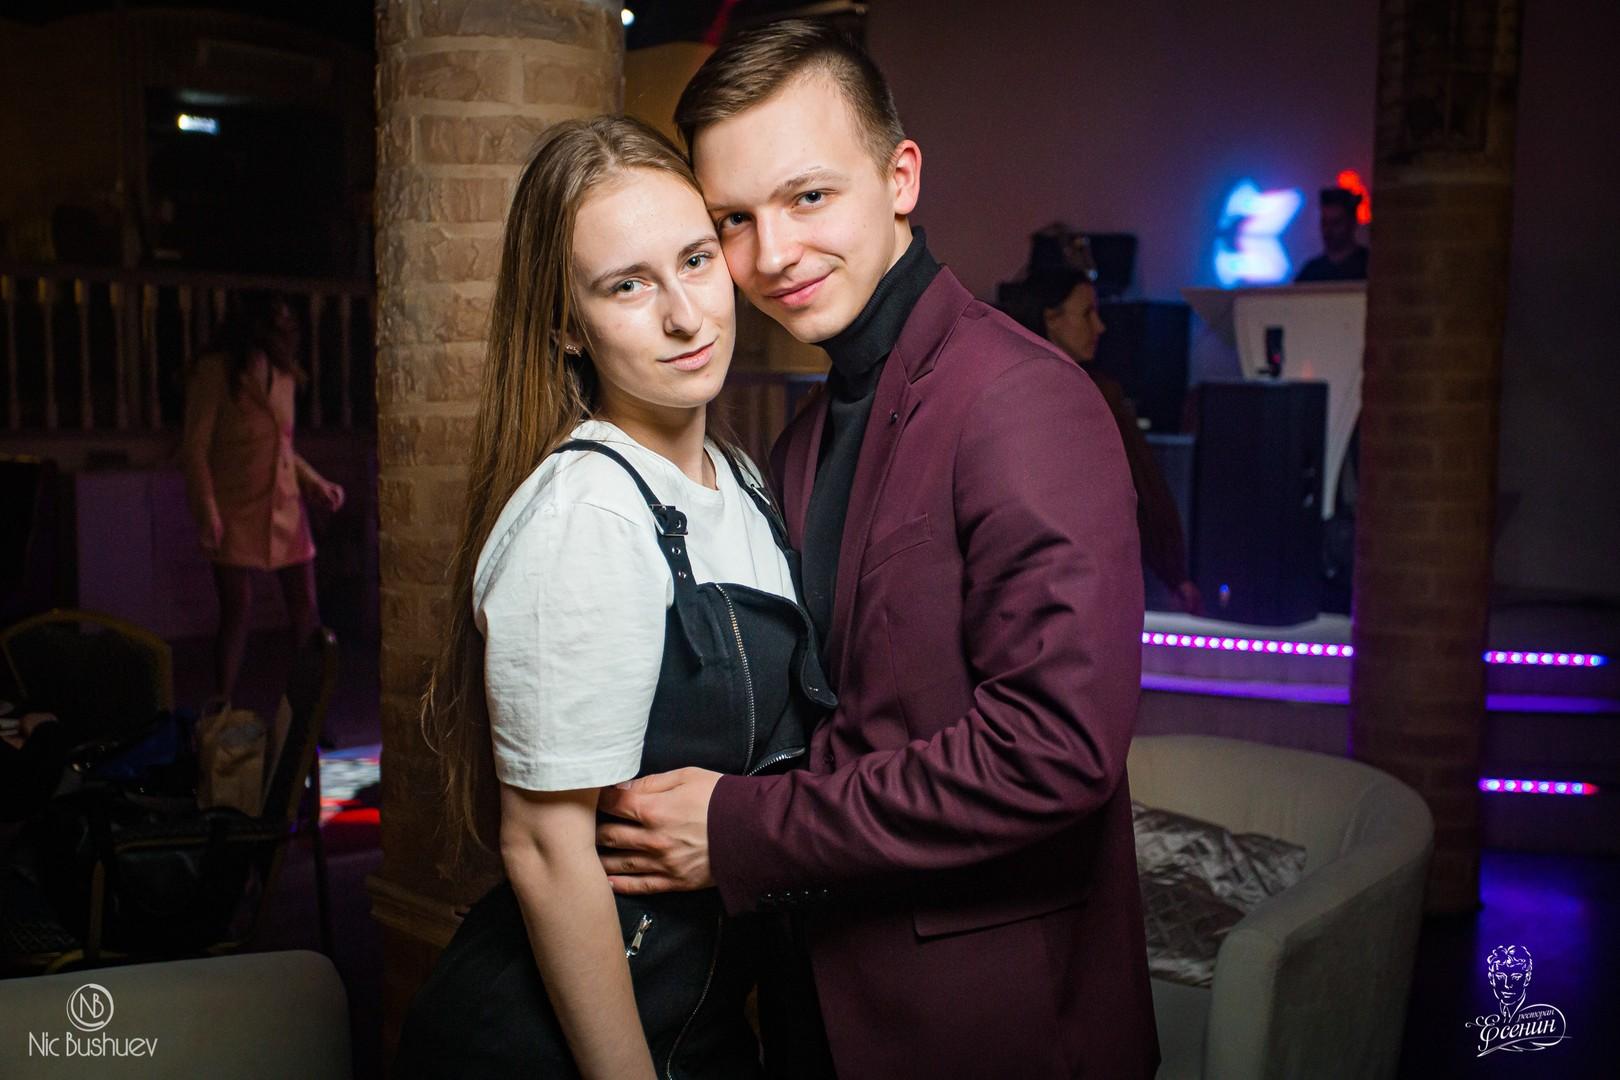 Ресторан Орехово-Зуево Есенин 14_02_2020 (58)